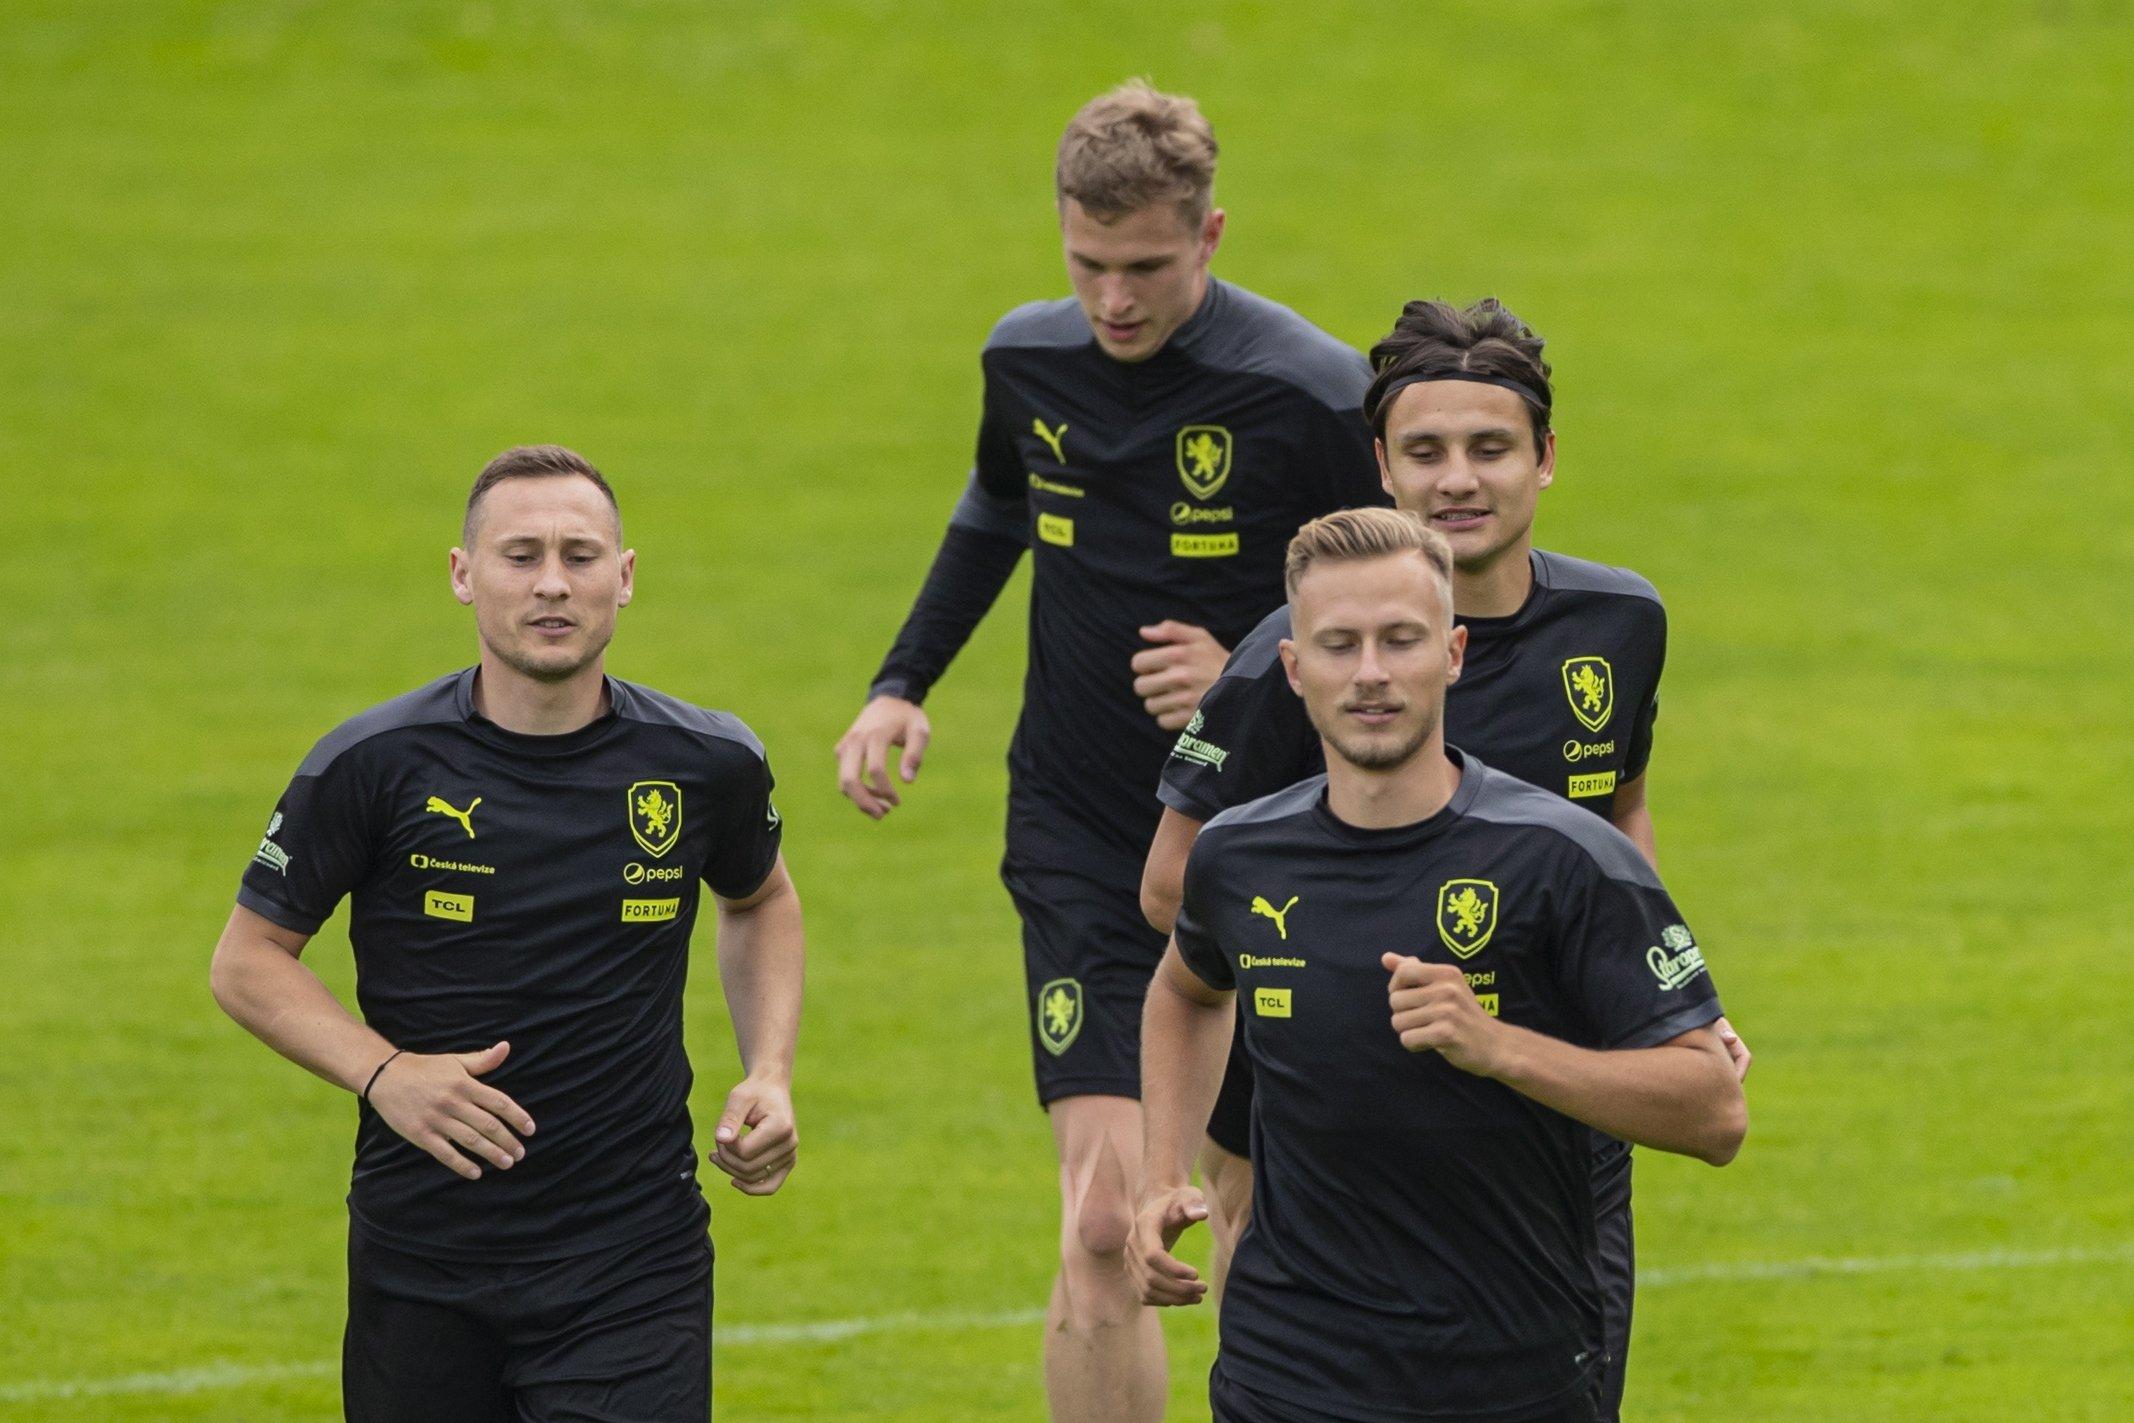 Czech Republic players attend a training session in Prague, Czech Republic, June 11, 2021. (EPA Photo)